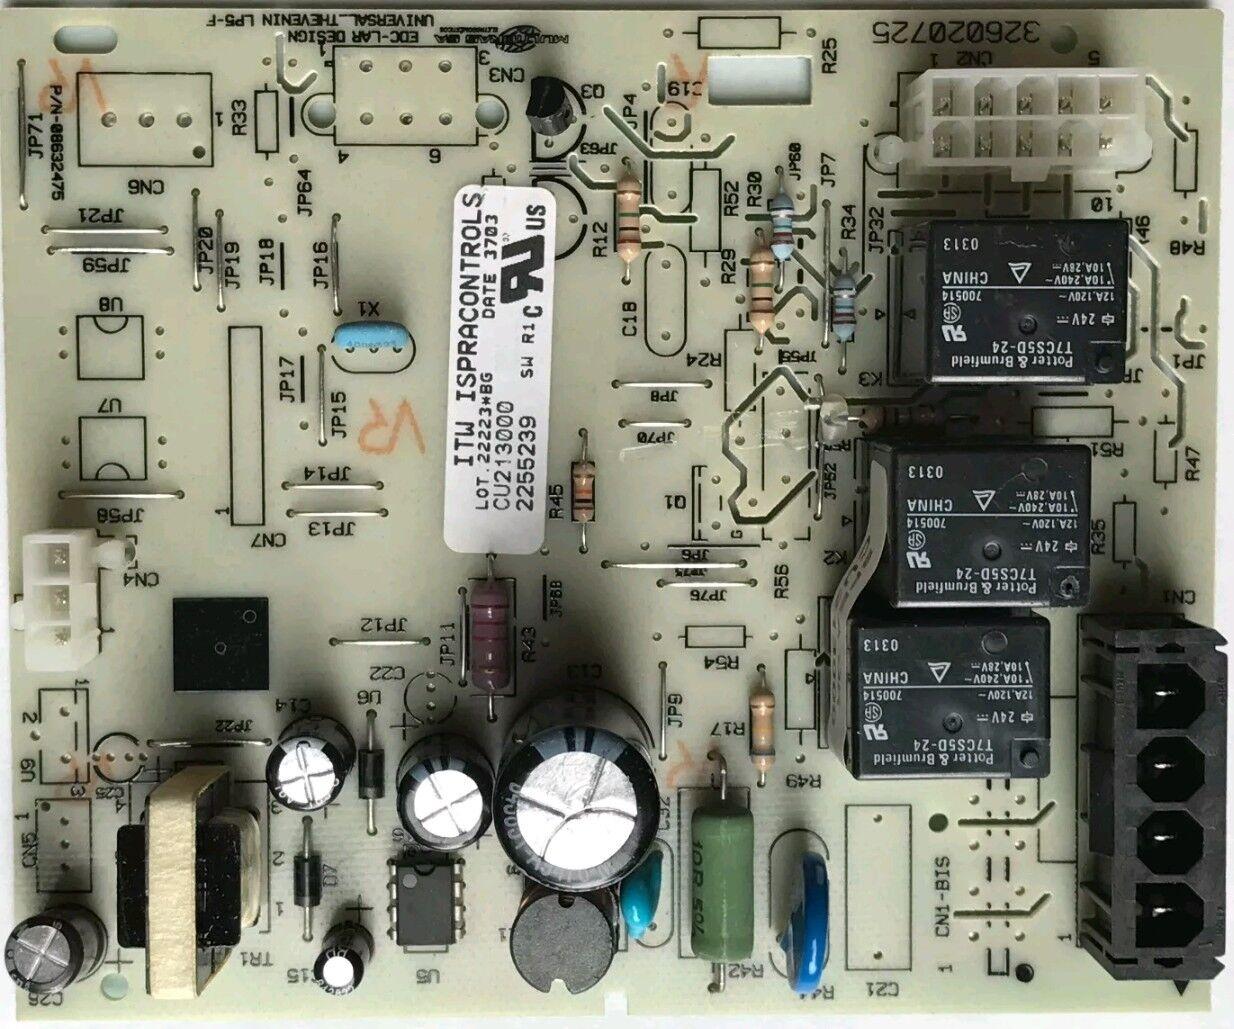 Refurbished Refrigerator control board.